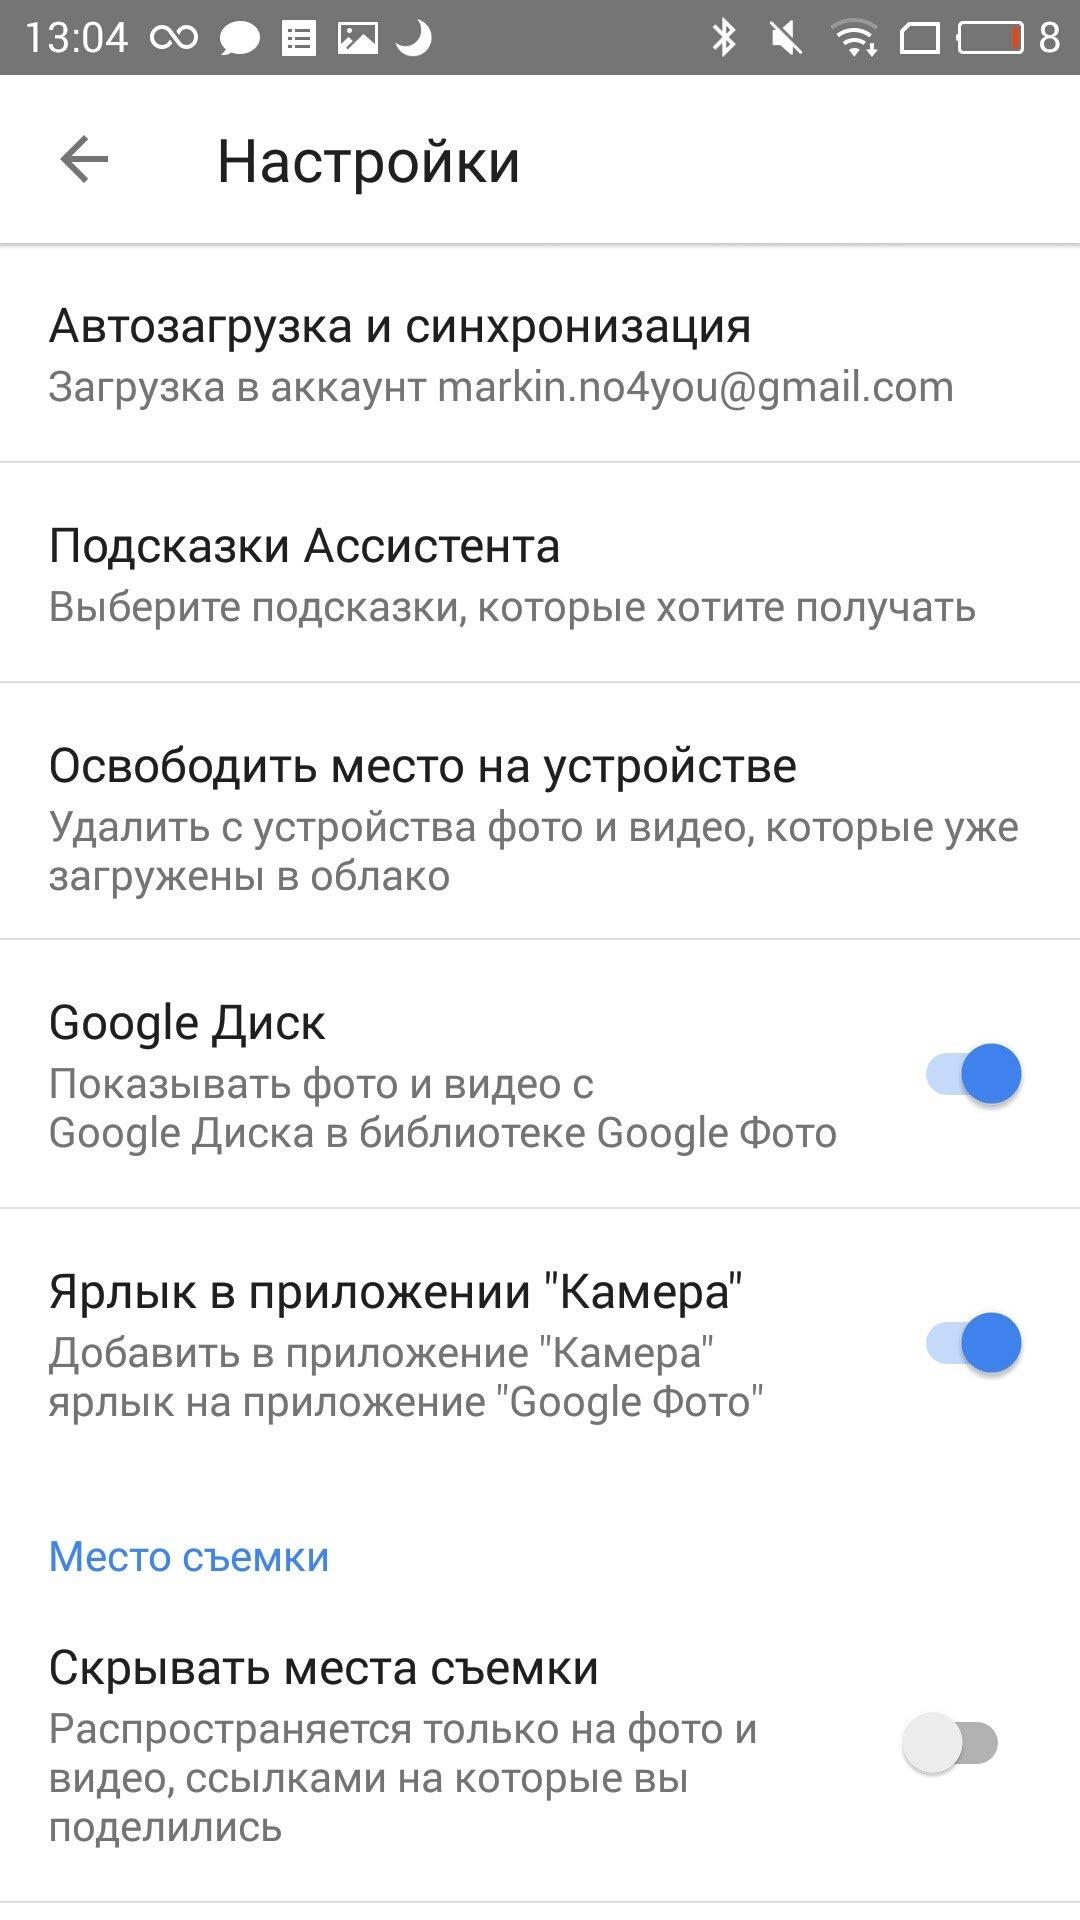 Настройка бекапа фотографий в Google фото на Android